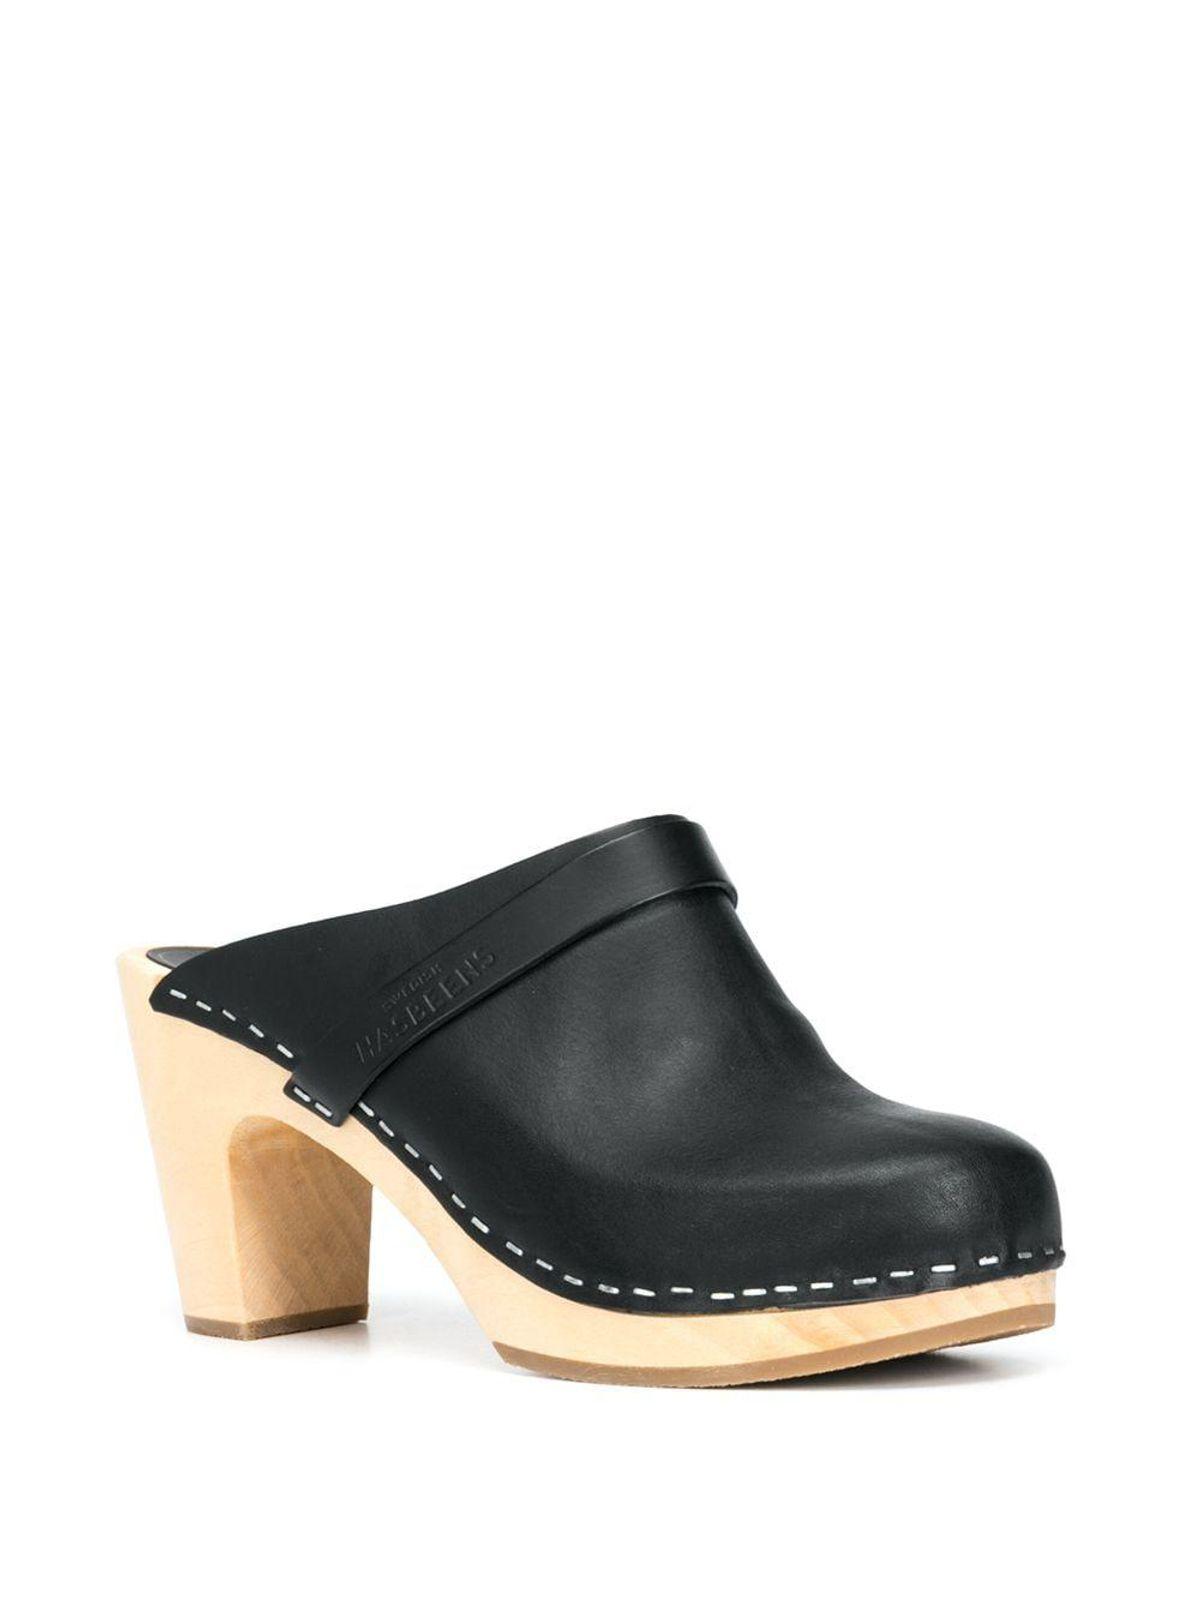 Slip-On High Heel Clogs